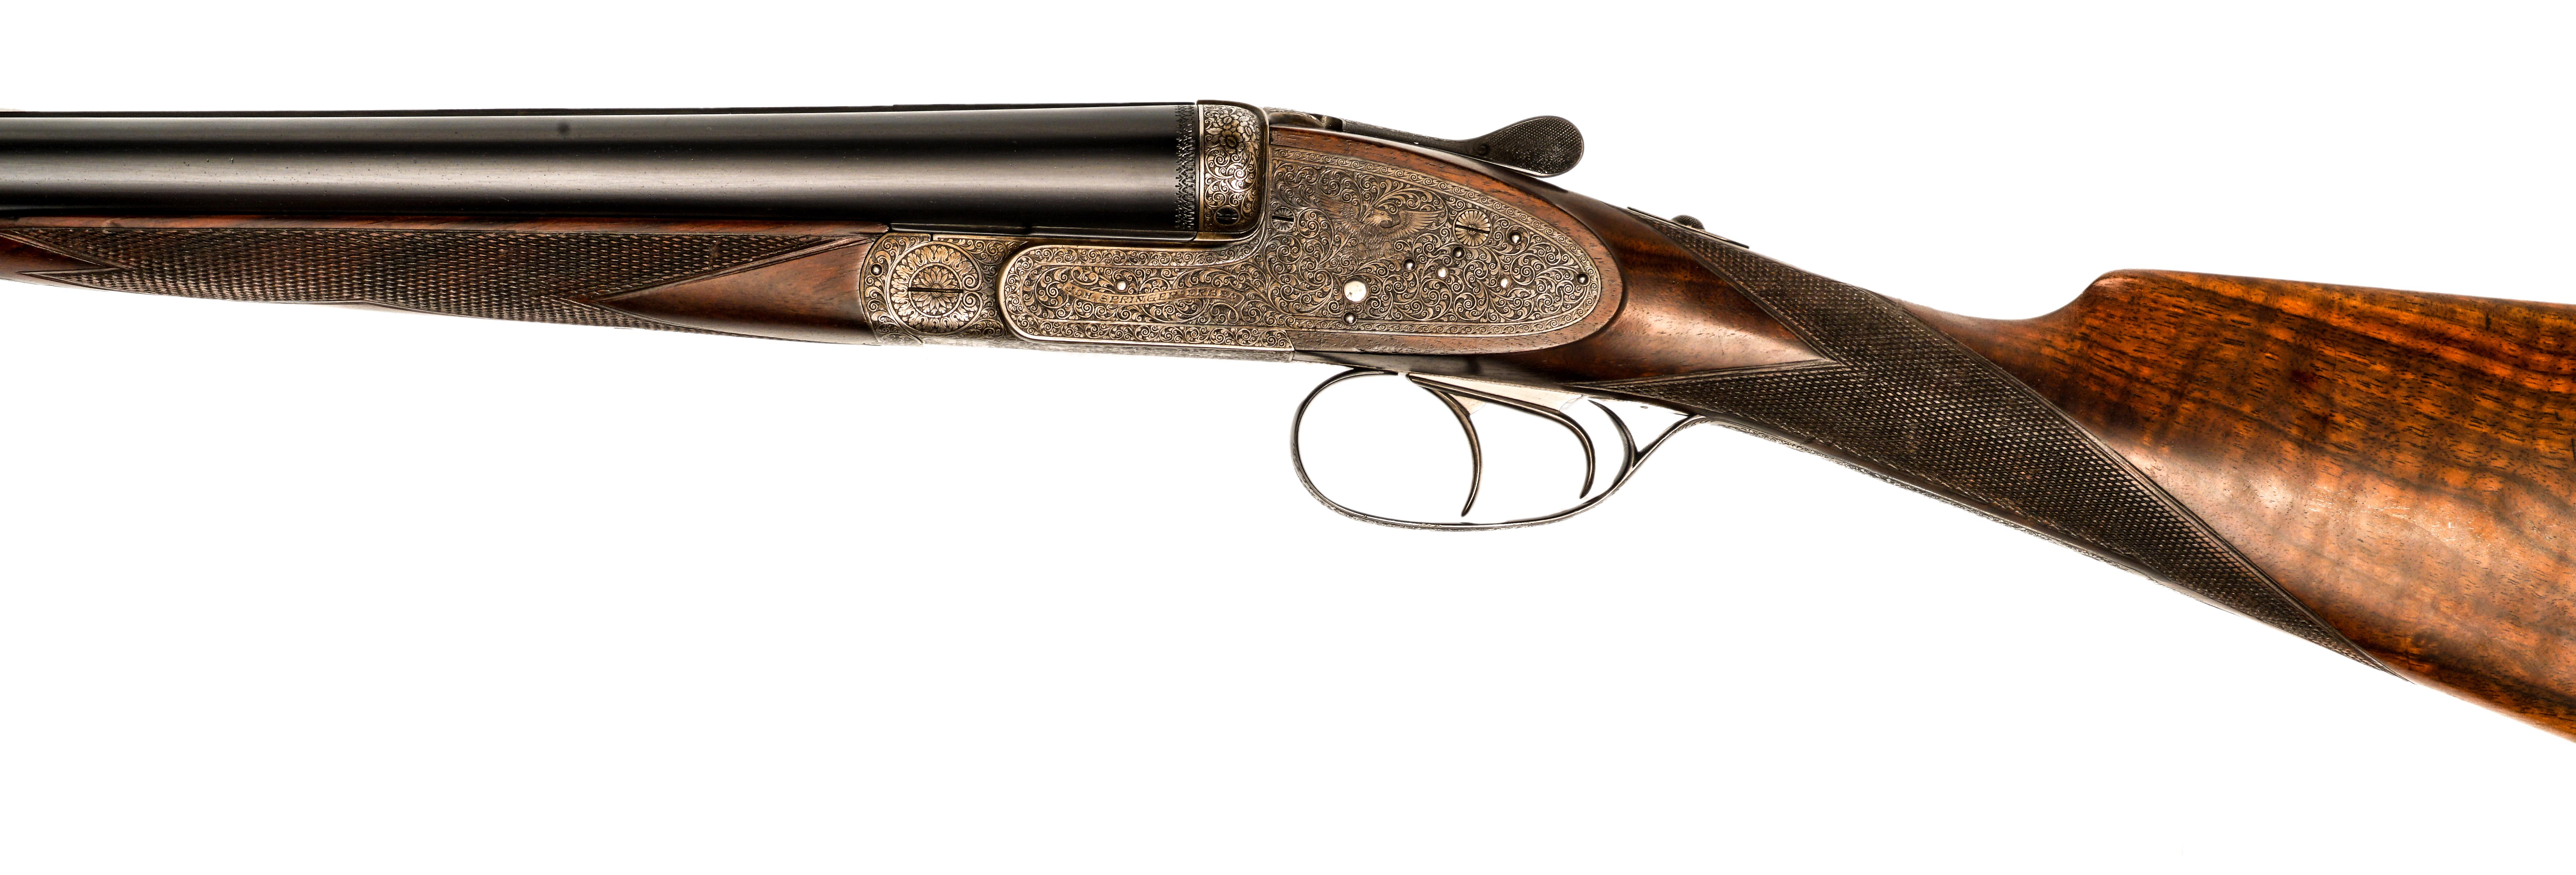 Custom guns and rifles manufacturing